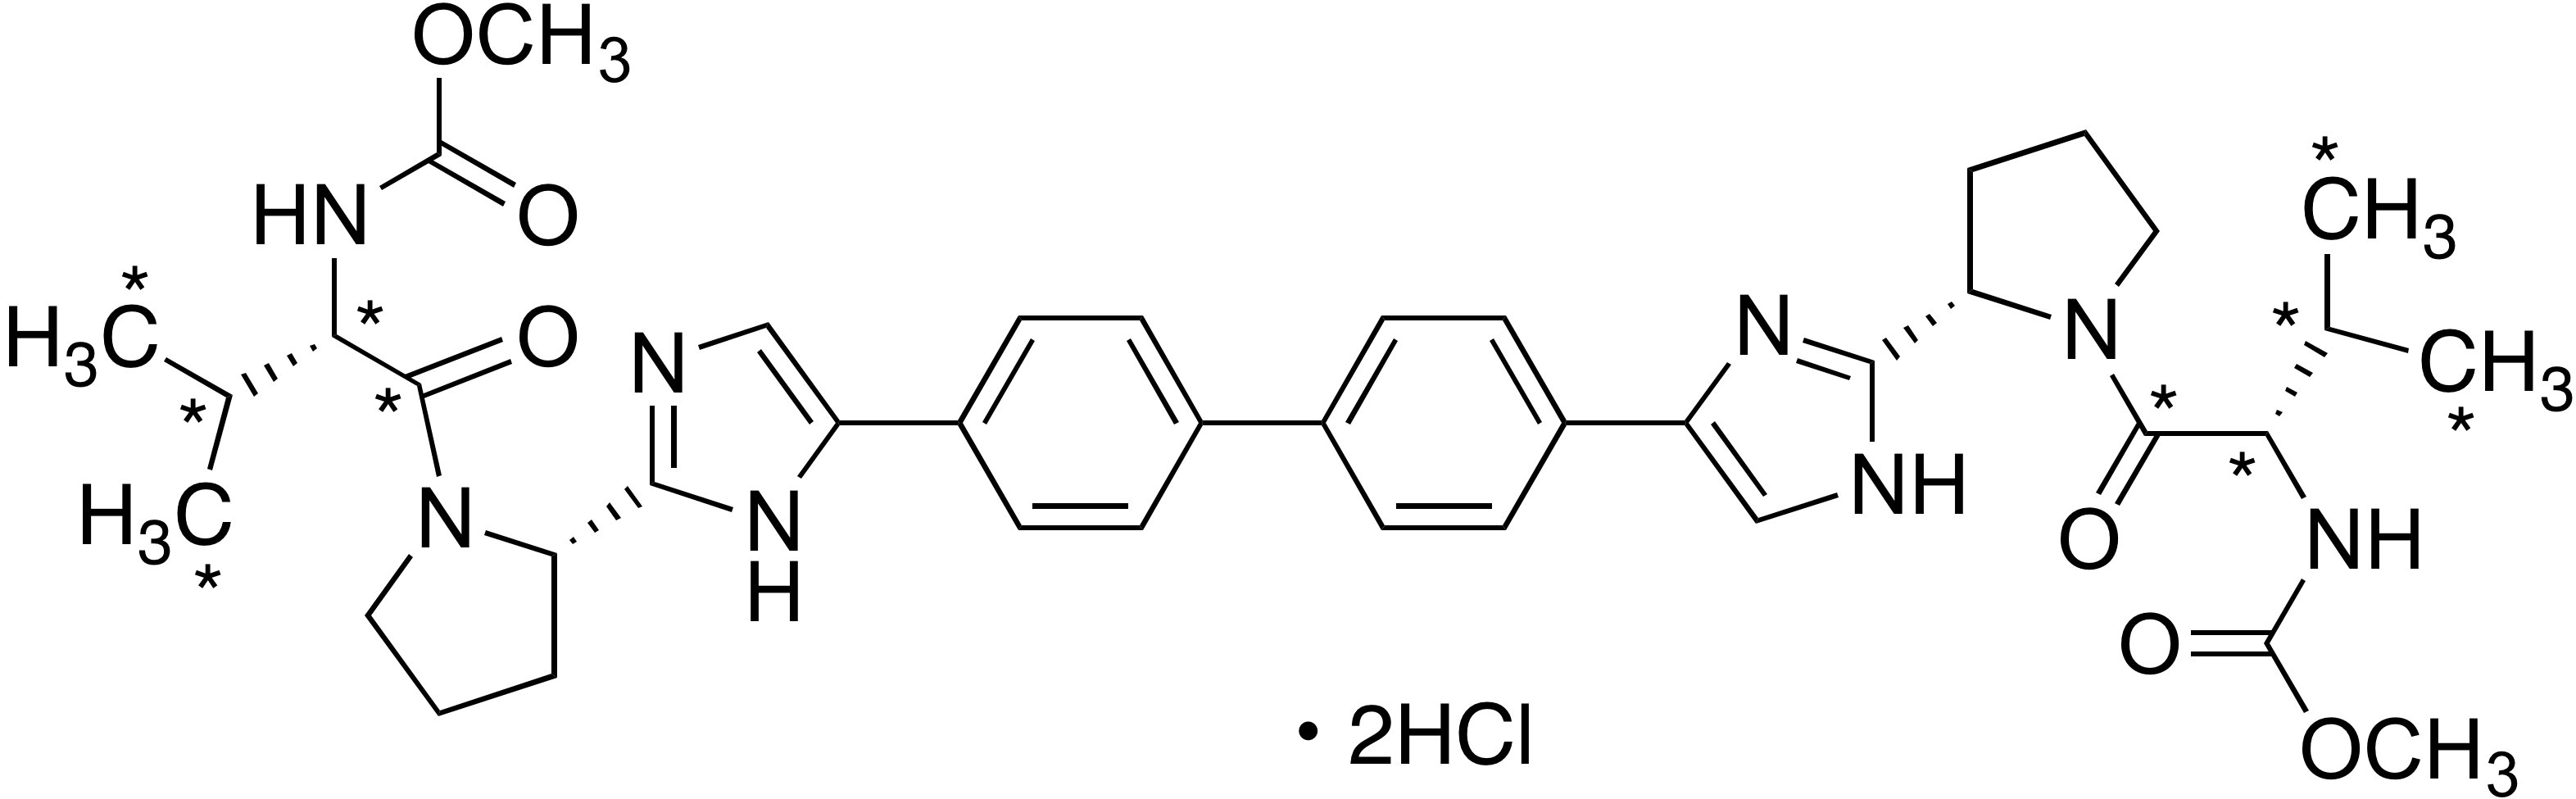 Daclatasvir-<sup>13</sup>C<sub>10 </sub> dihydrochloride